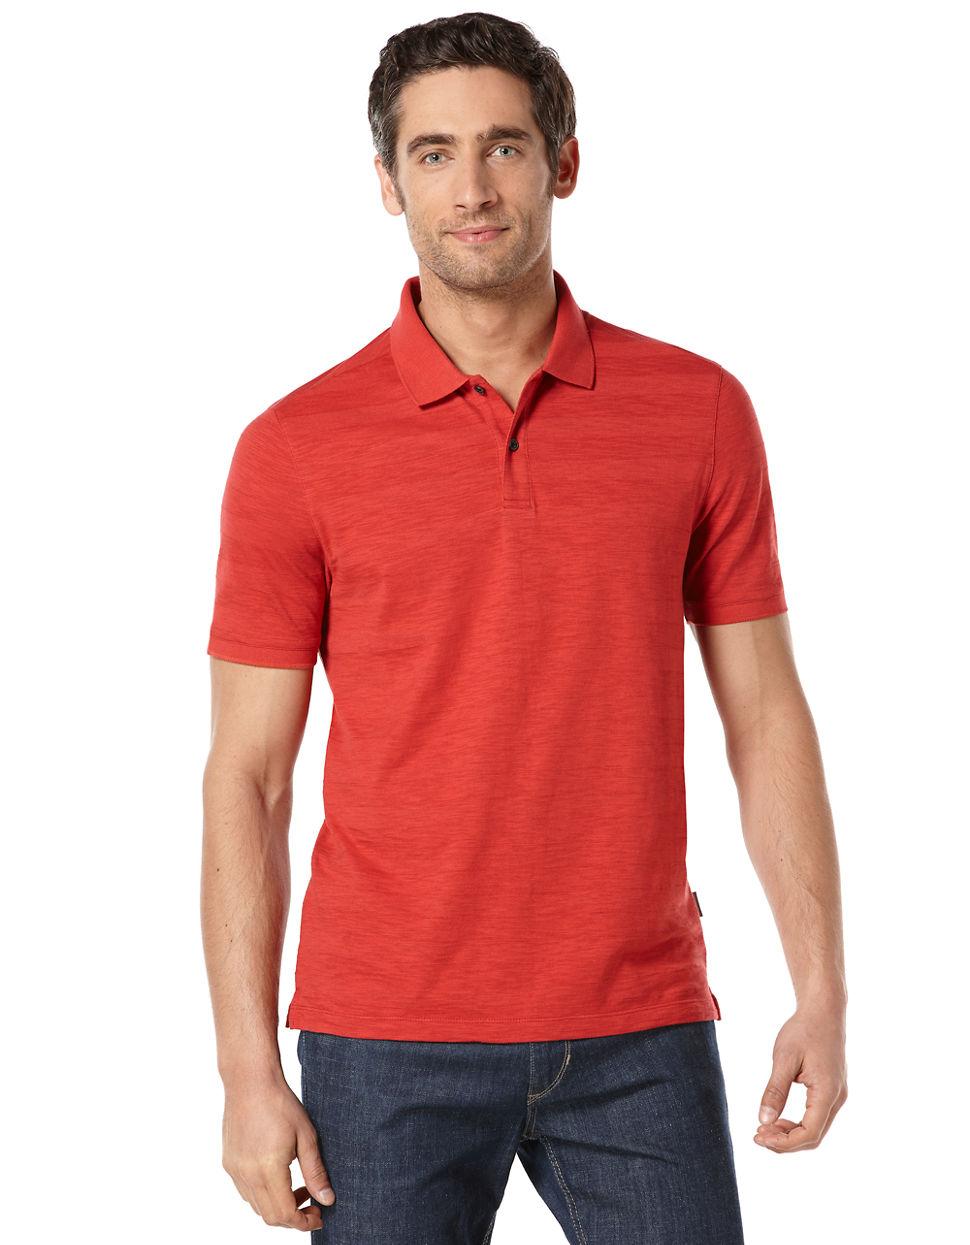 Perry Ellis Slub Stripe Polo Shirt In Red For Men (Bright